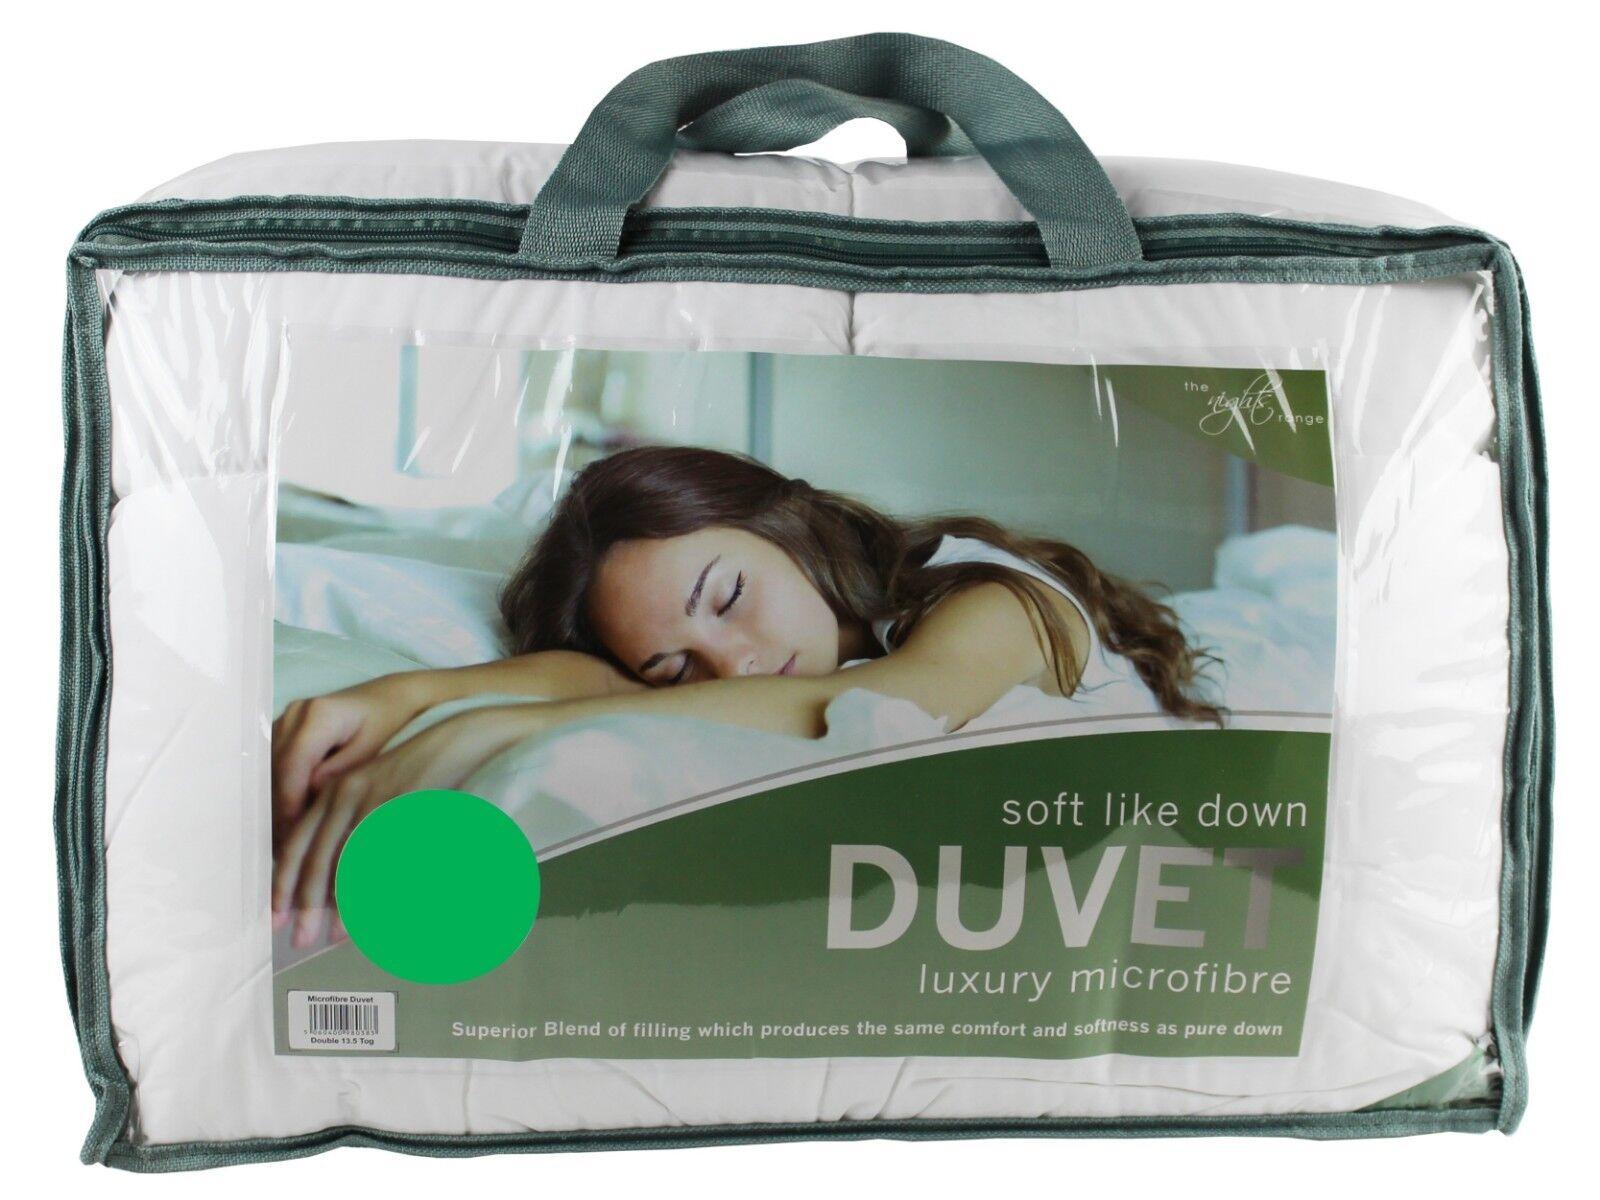 Luxury 10.5 Tog Microfibre Duvet Sanft Feels Like Down Duvet Hotel Quality Quilts